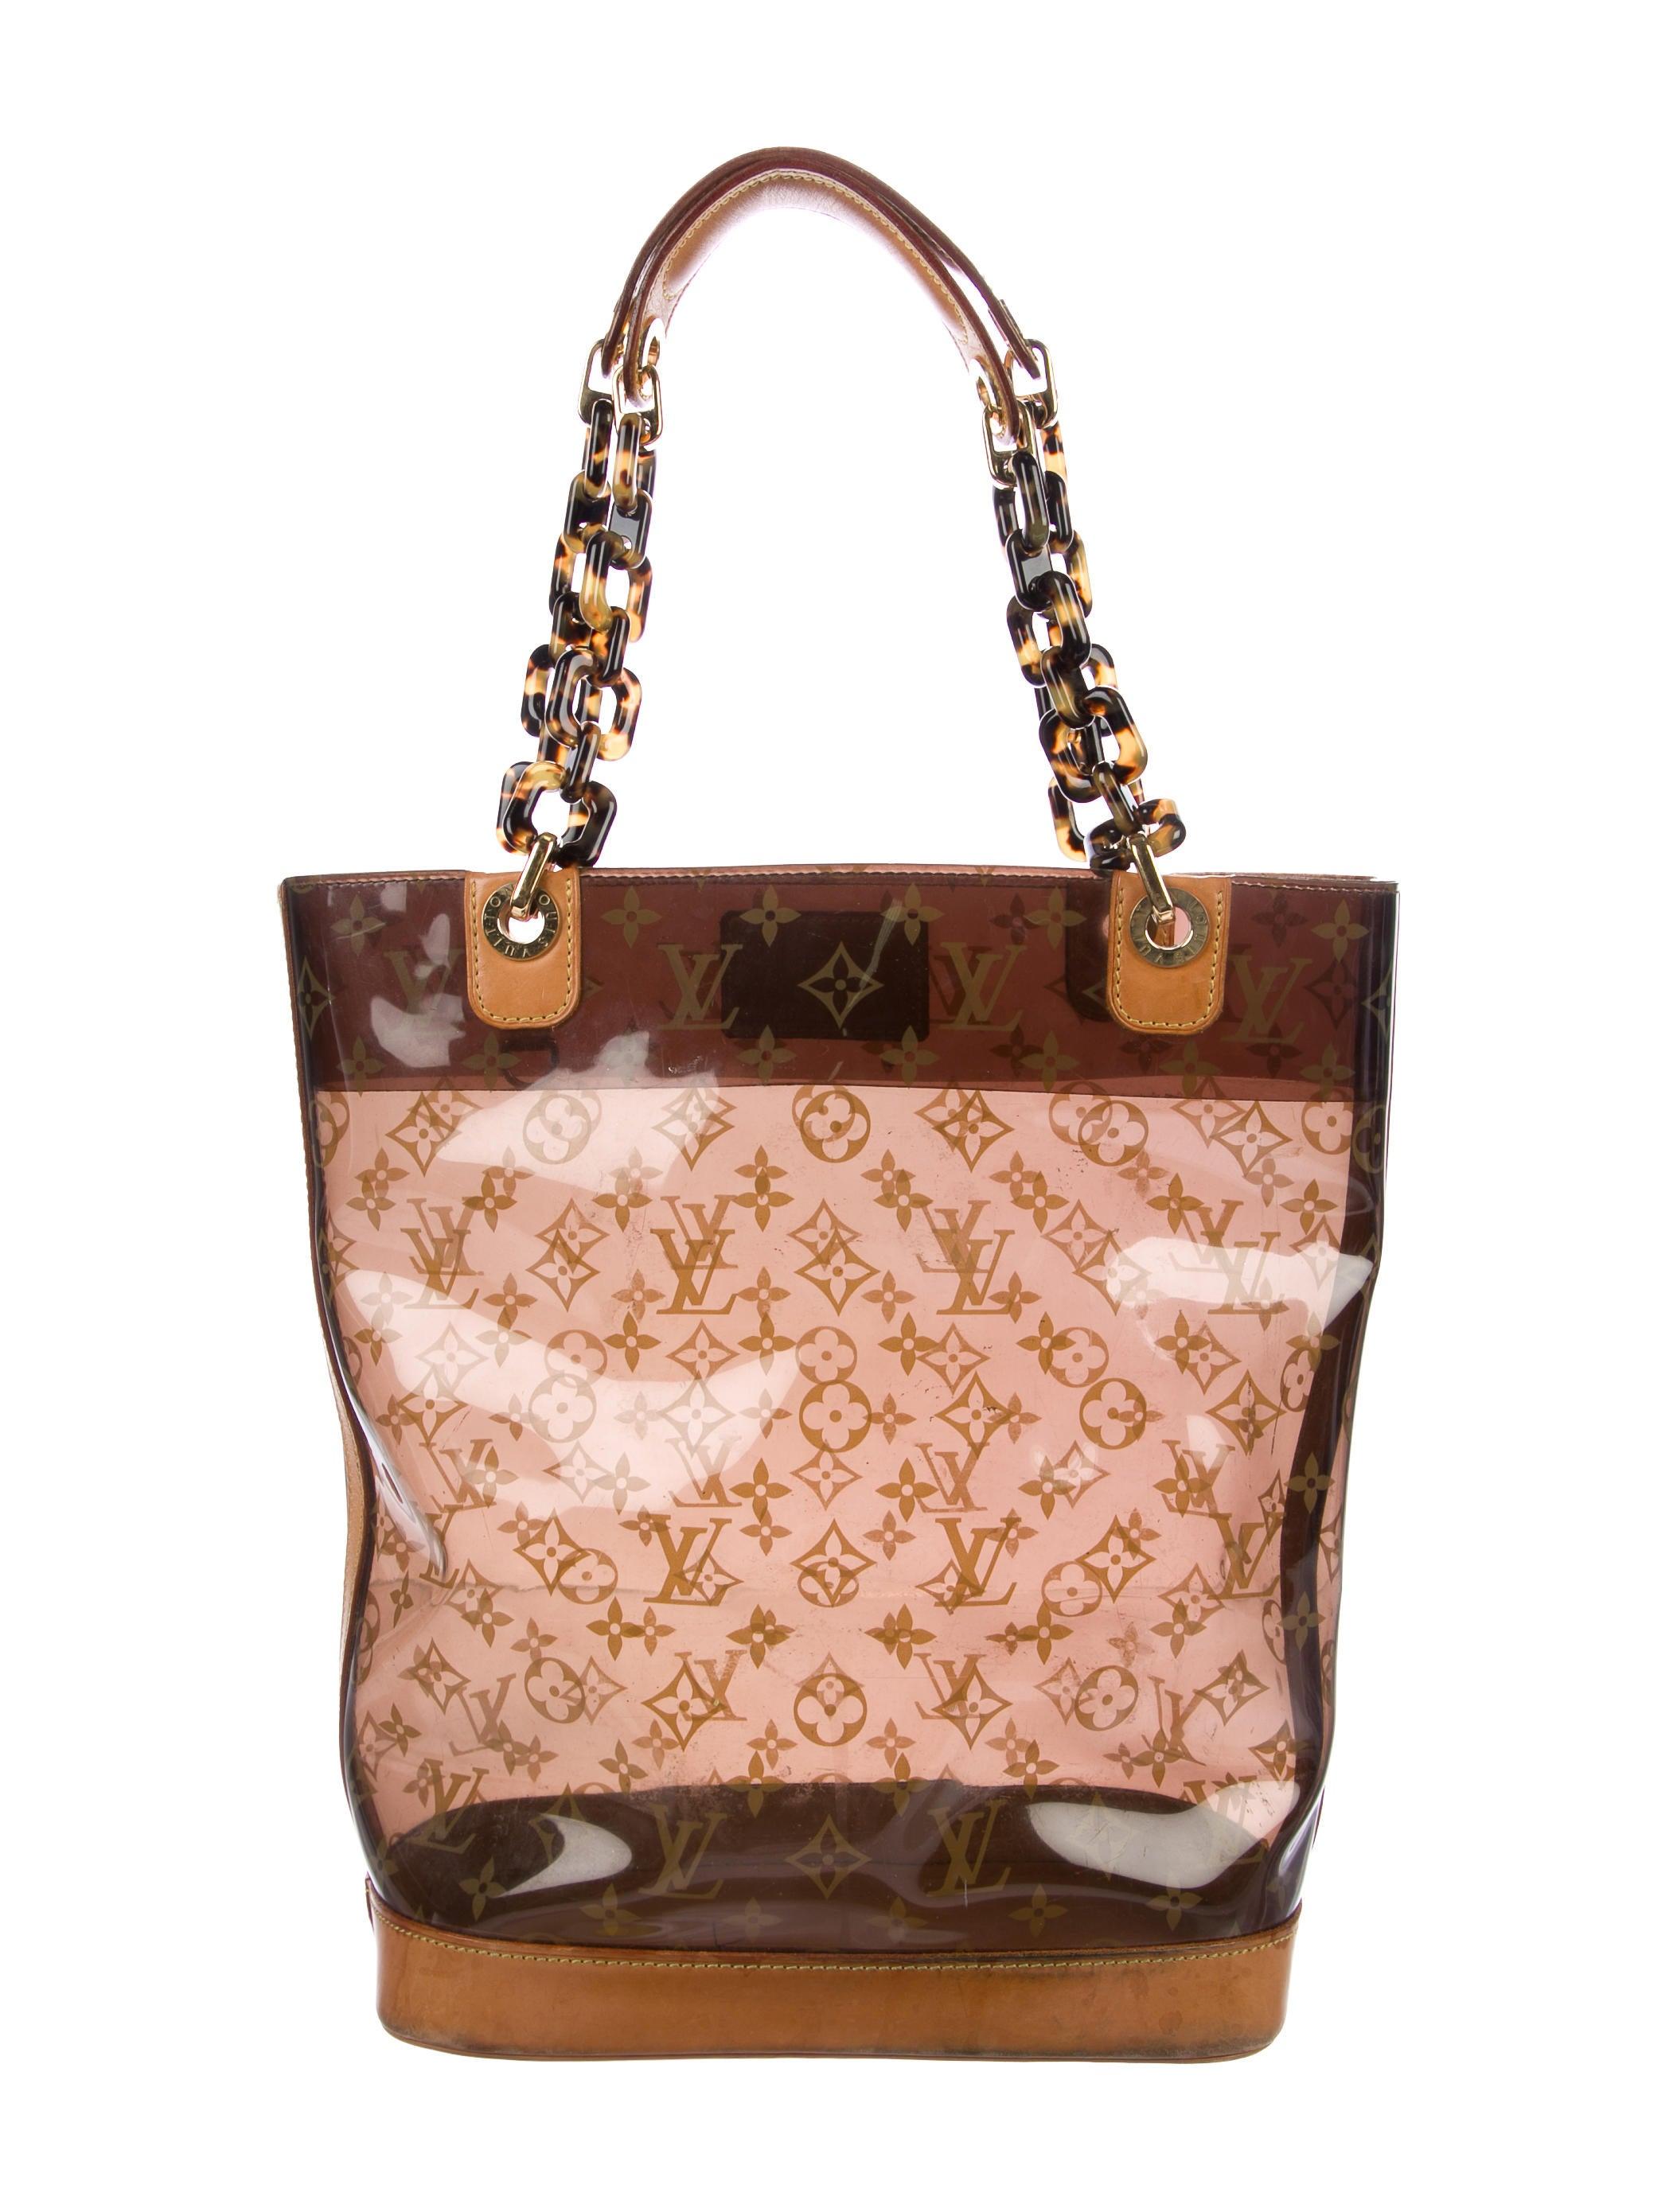 Sac Louis Vuitton Matelassé : Louis vuitton monogram sac ambre mm handbags lou